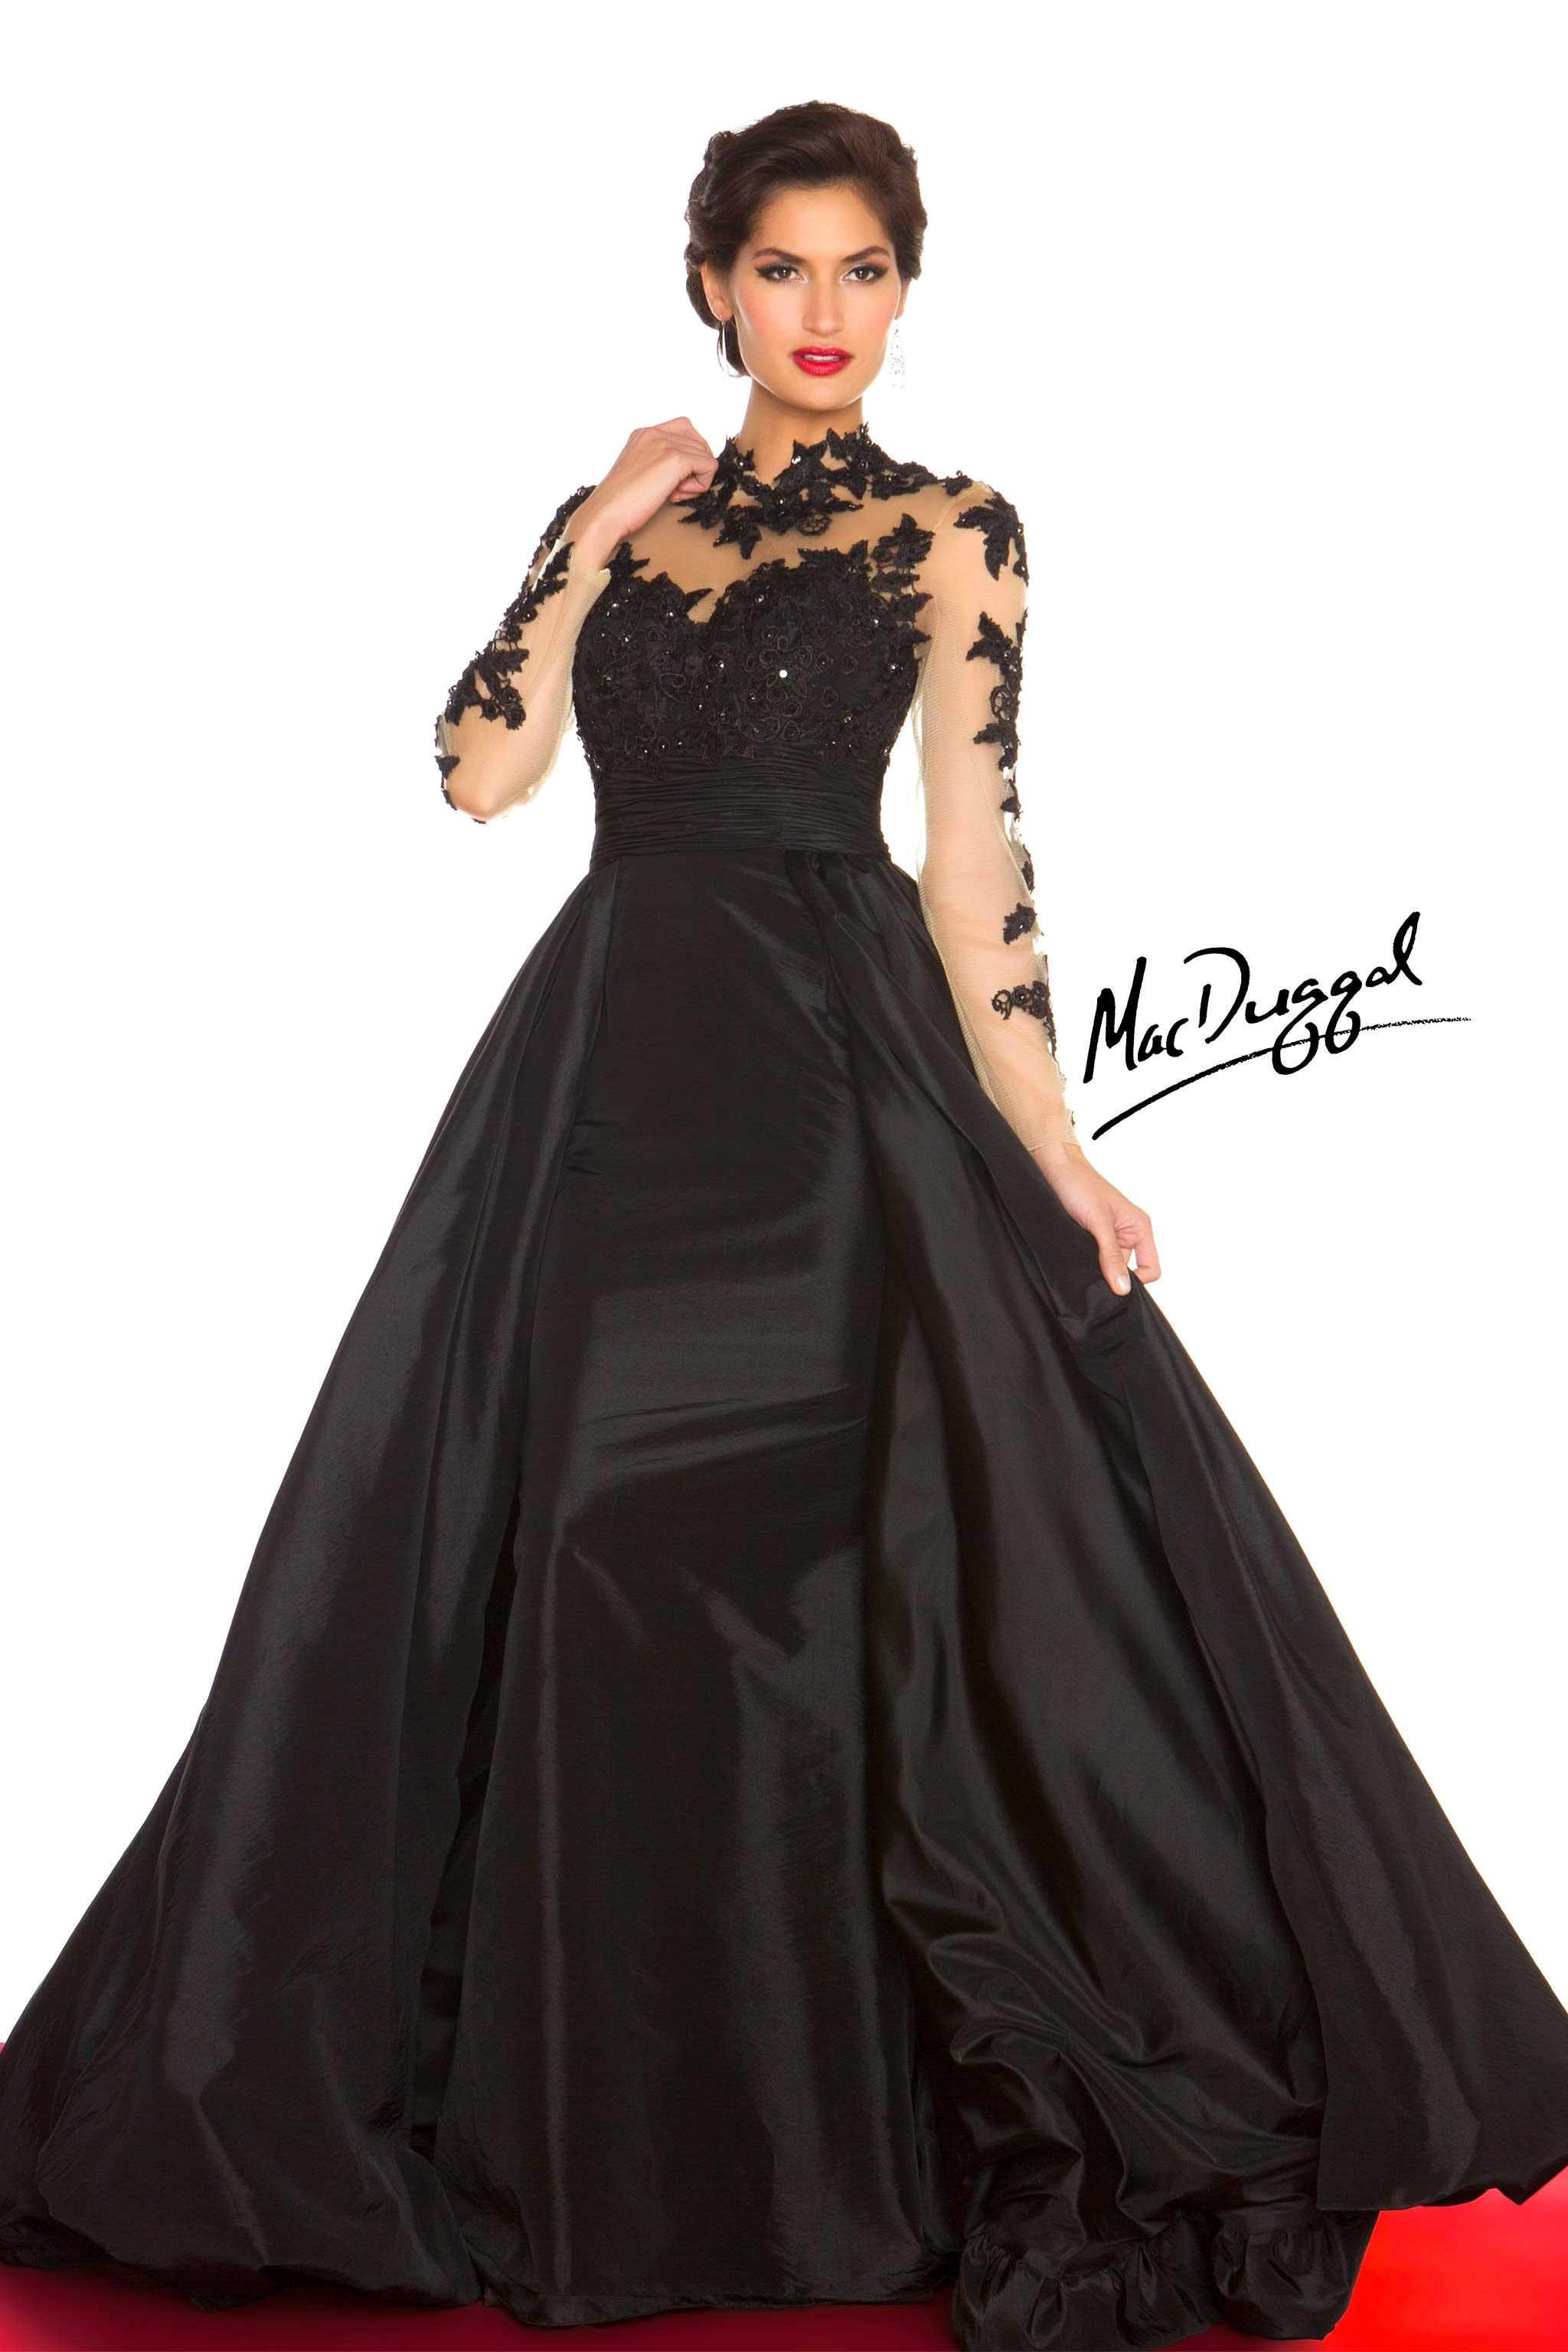 Black dress hollywood - Old Hollywood Glamour Black Dresses Google Search